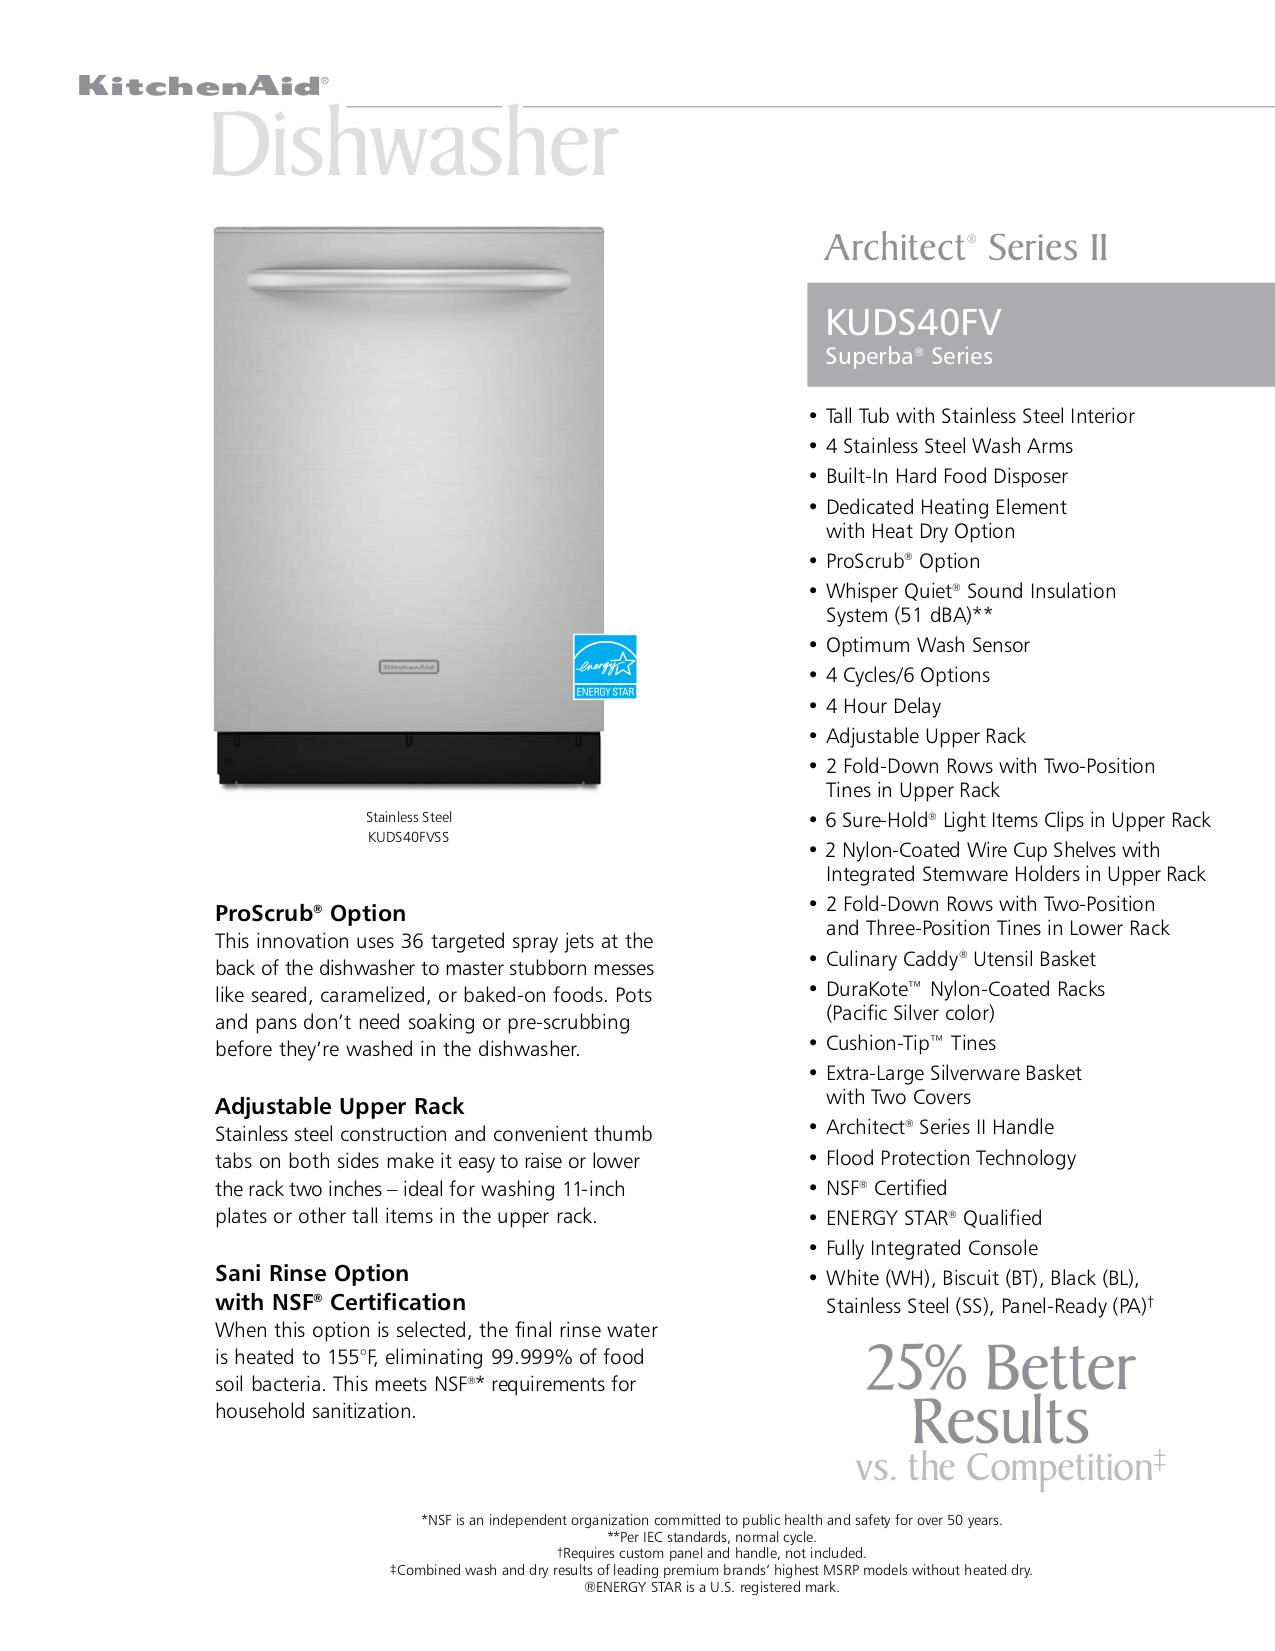 Download Free Pdf For Kitchenaid Architect Ii Kuds40fv Dishwasher Manual